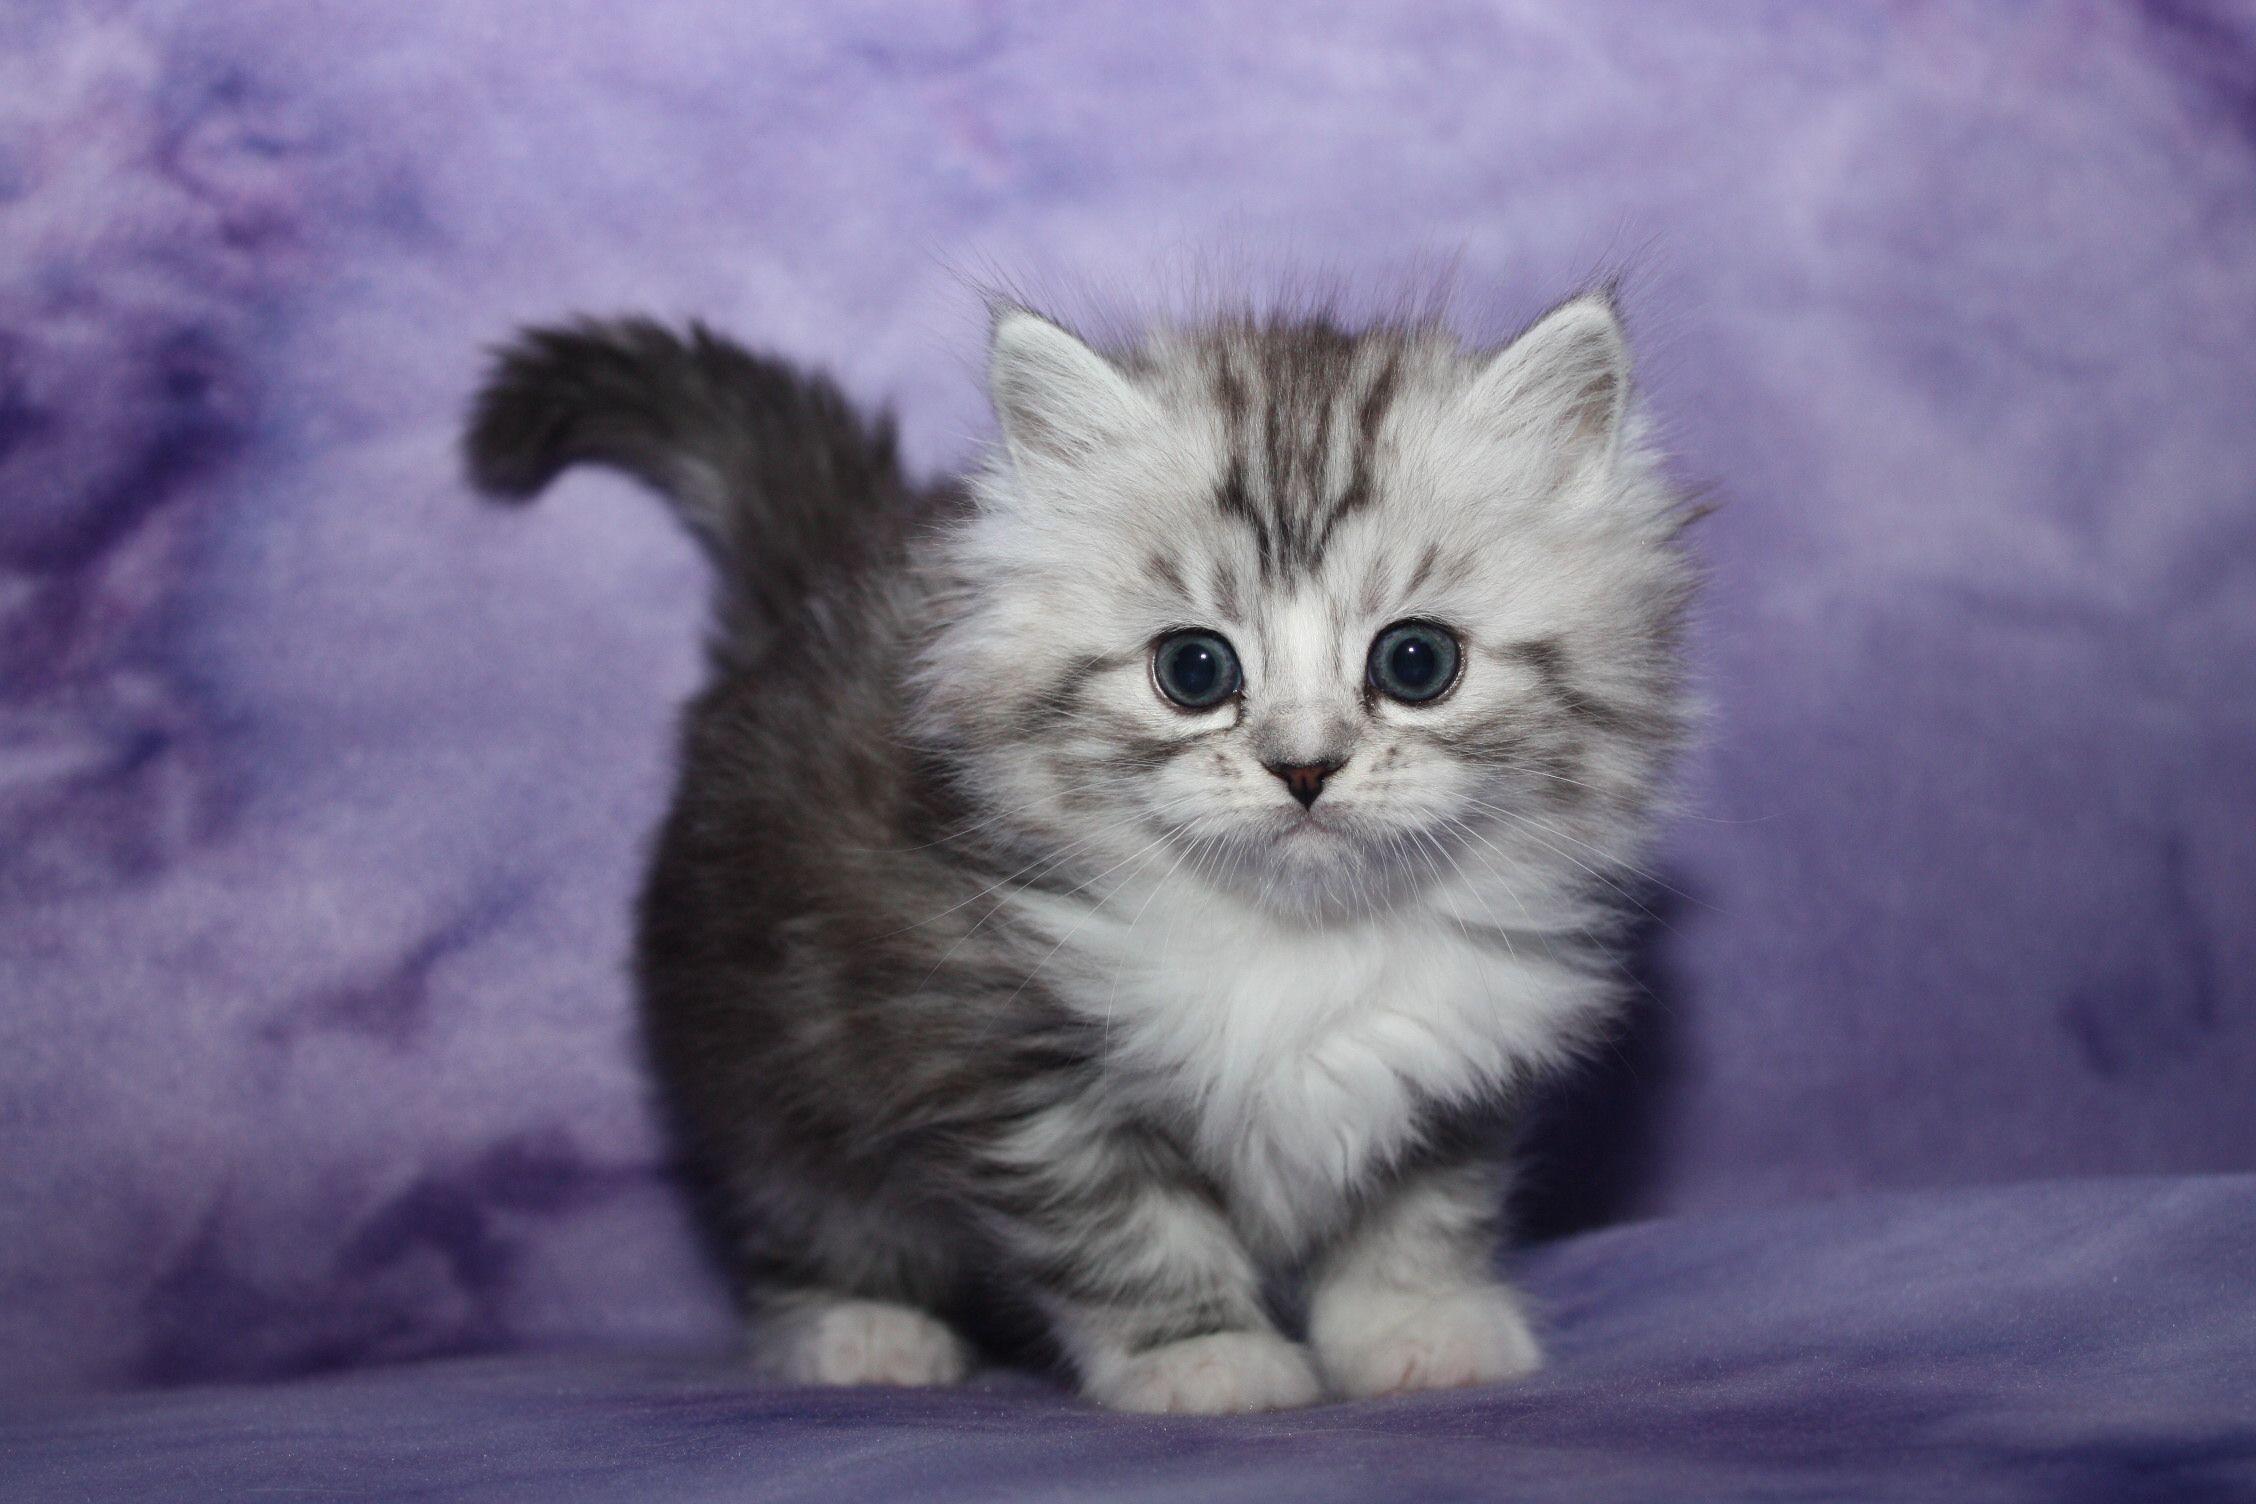 ragamuffin kittens for sale, ragamuffin kittens